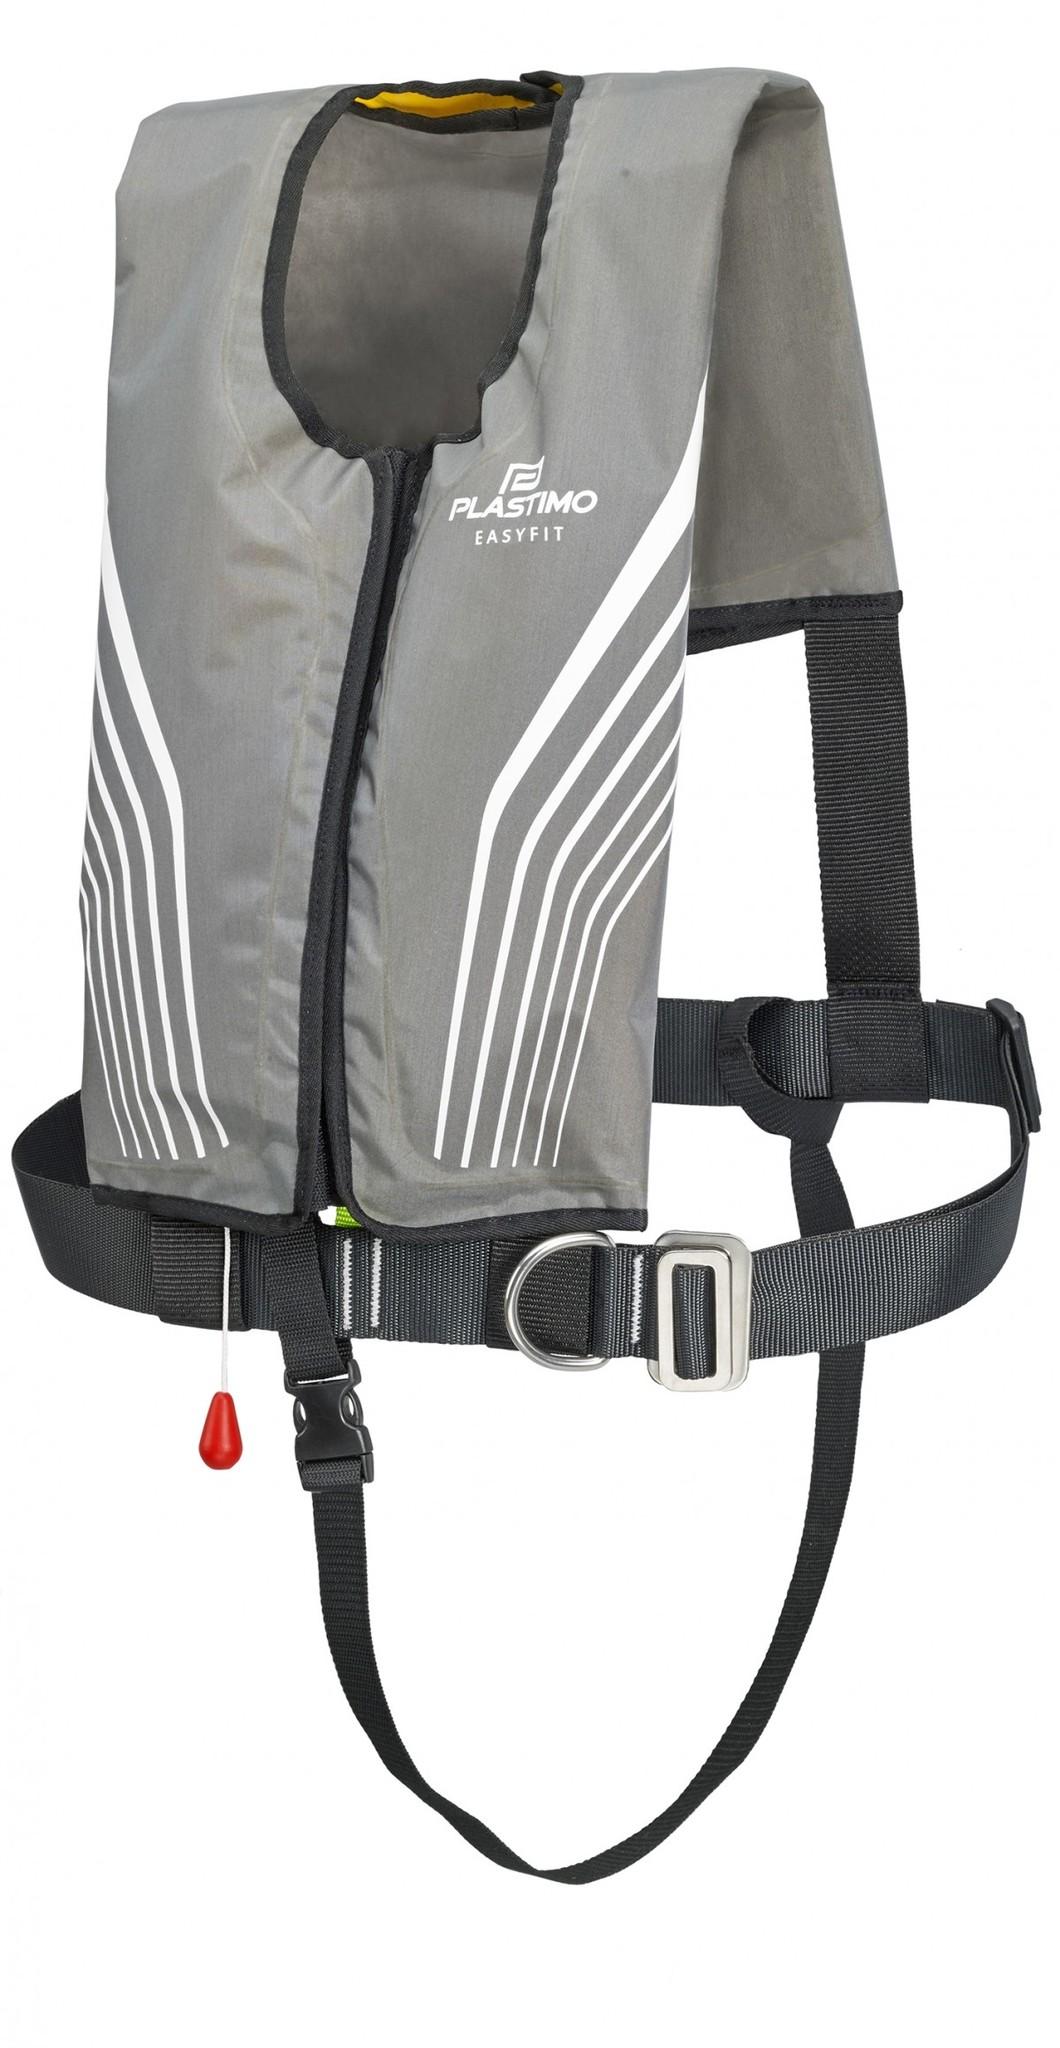 Easyfit inflatable lifejacket